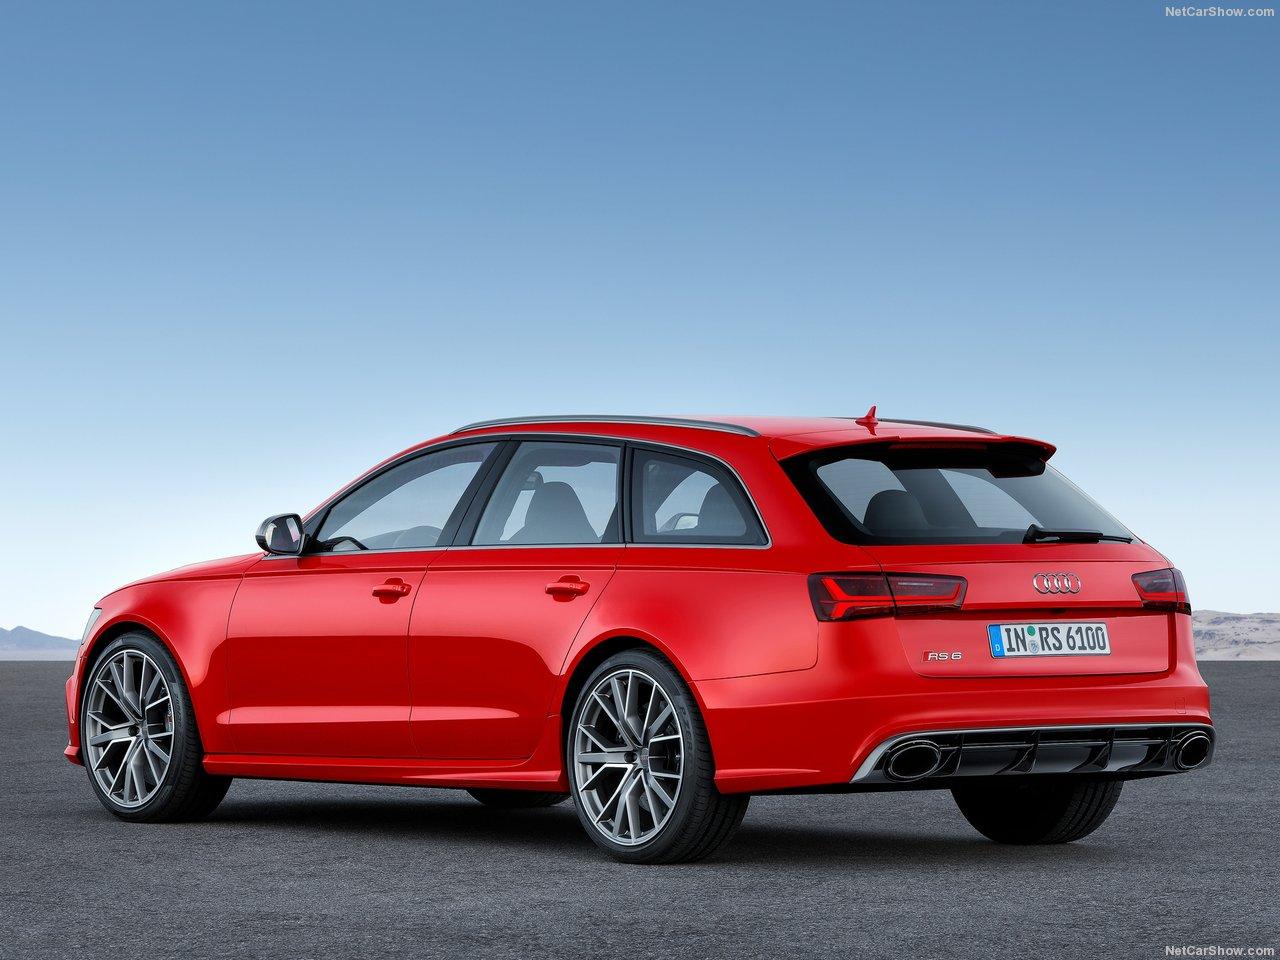 Audi-RS6_Avant_performance_2016_1280x960_wallpaper_08